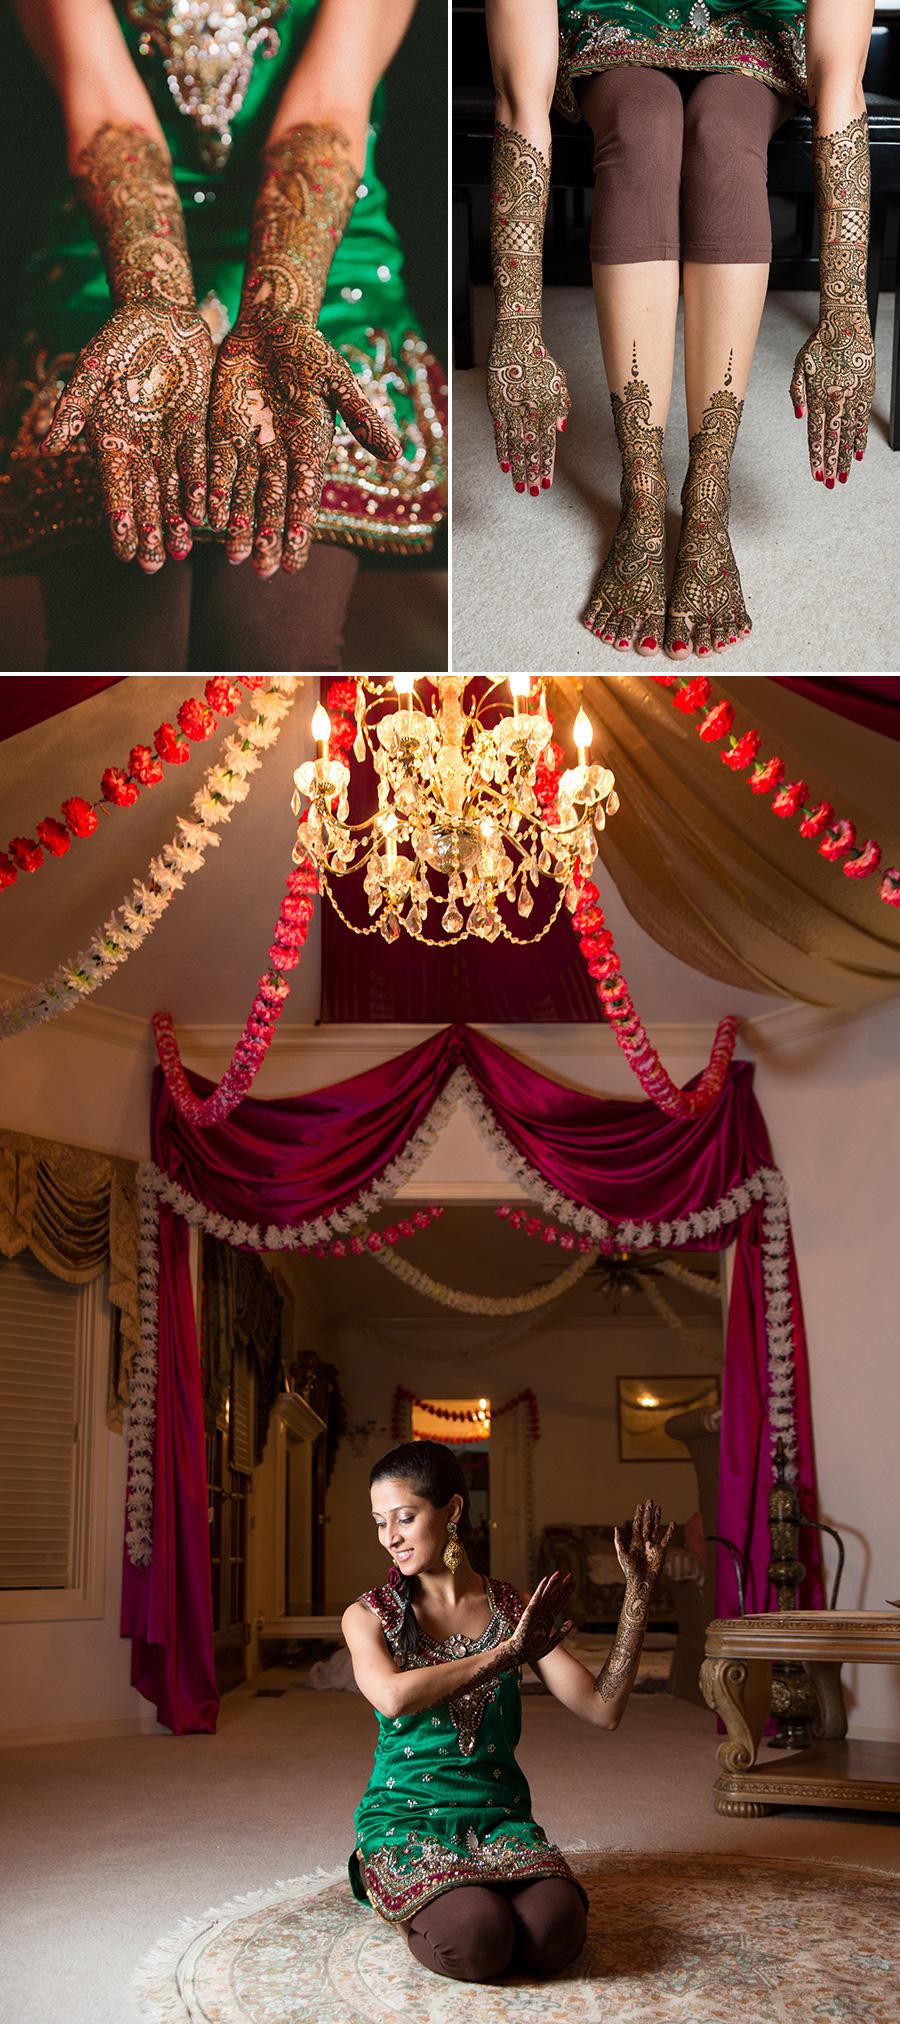 Deepikas Mehndi Night  Bay Area Mehndi Photography  Wedding Documentary Photo  Cinema